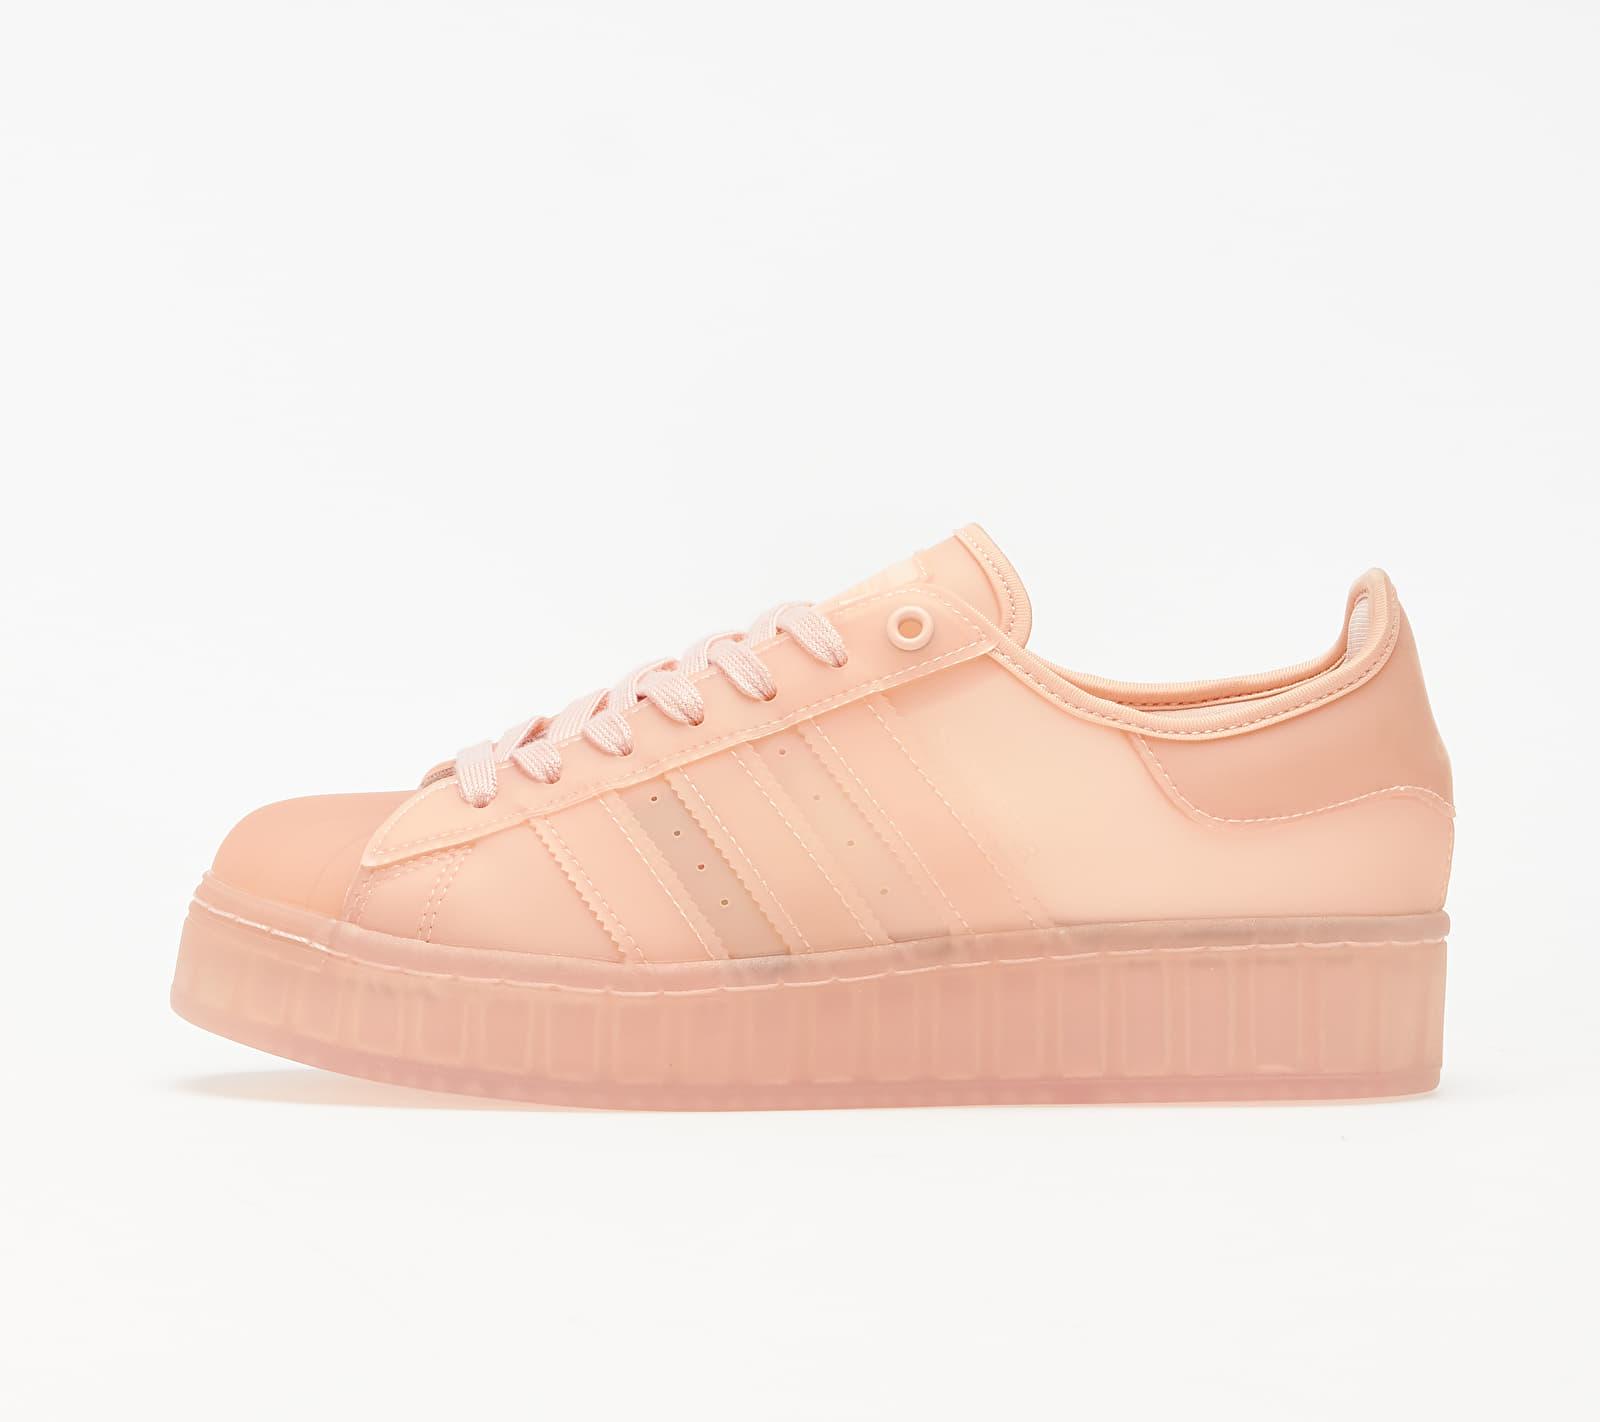 adidas Superstar Jelly W Vapor Pink/ Vapor Pink/ Ftw White EUR 41 1/3